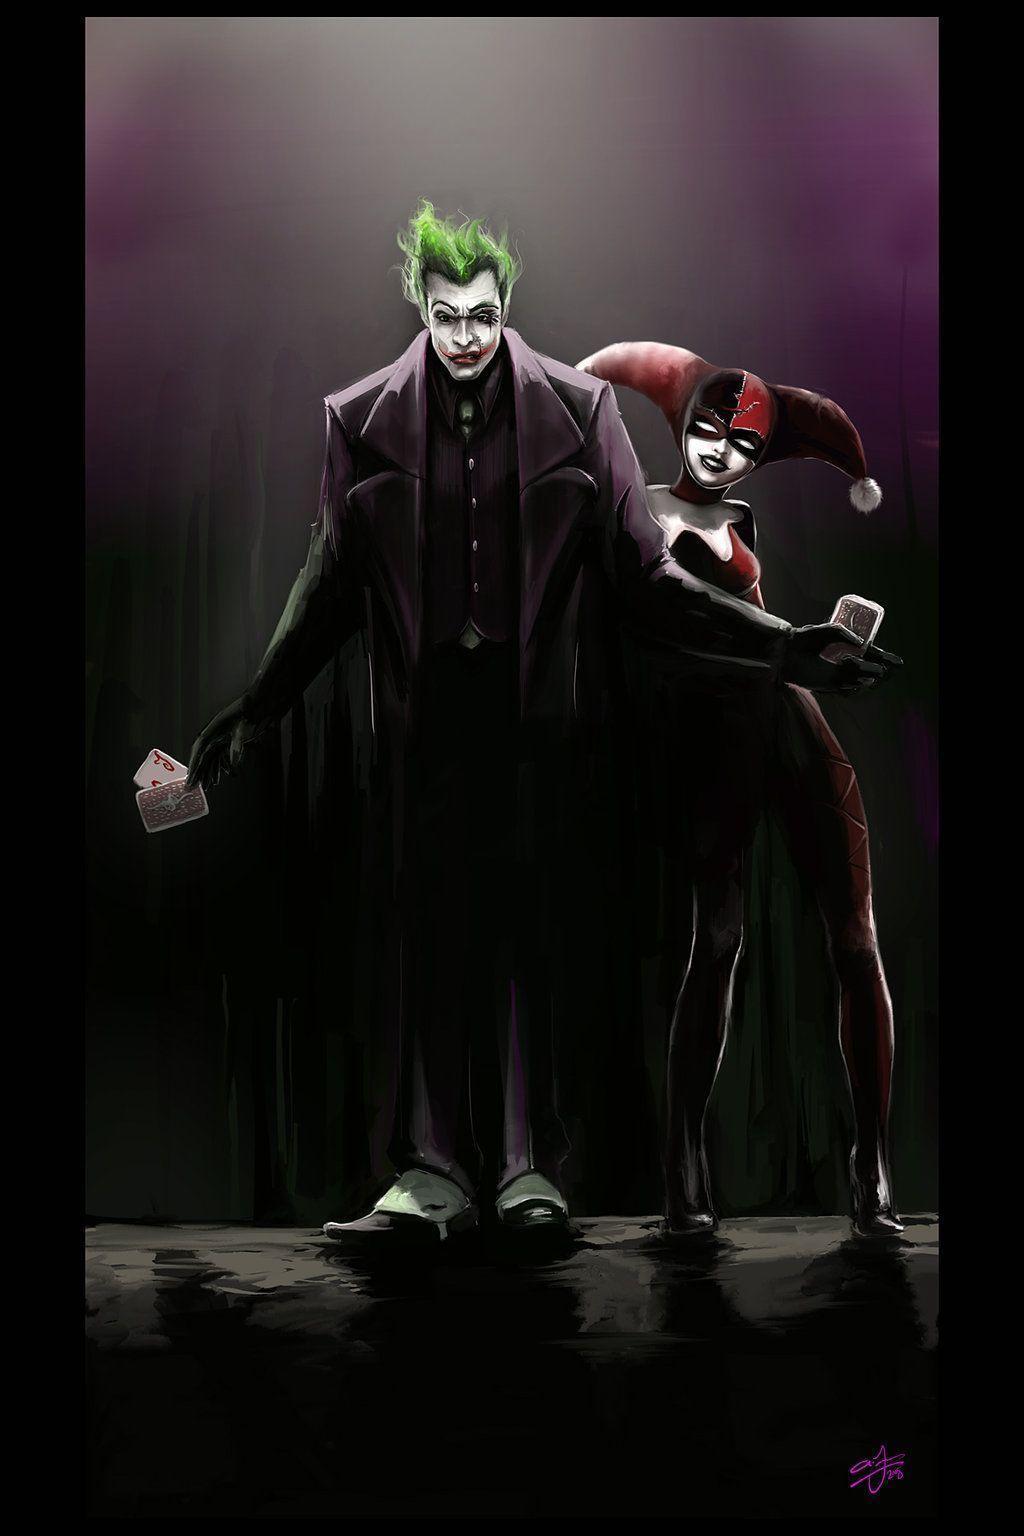 Joker and harley quinn wallpapers wallpaper cave for Harley quinn wallpaper